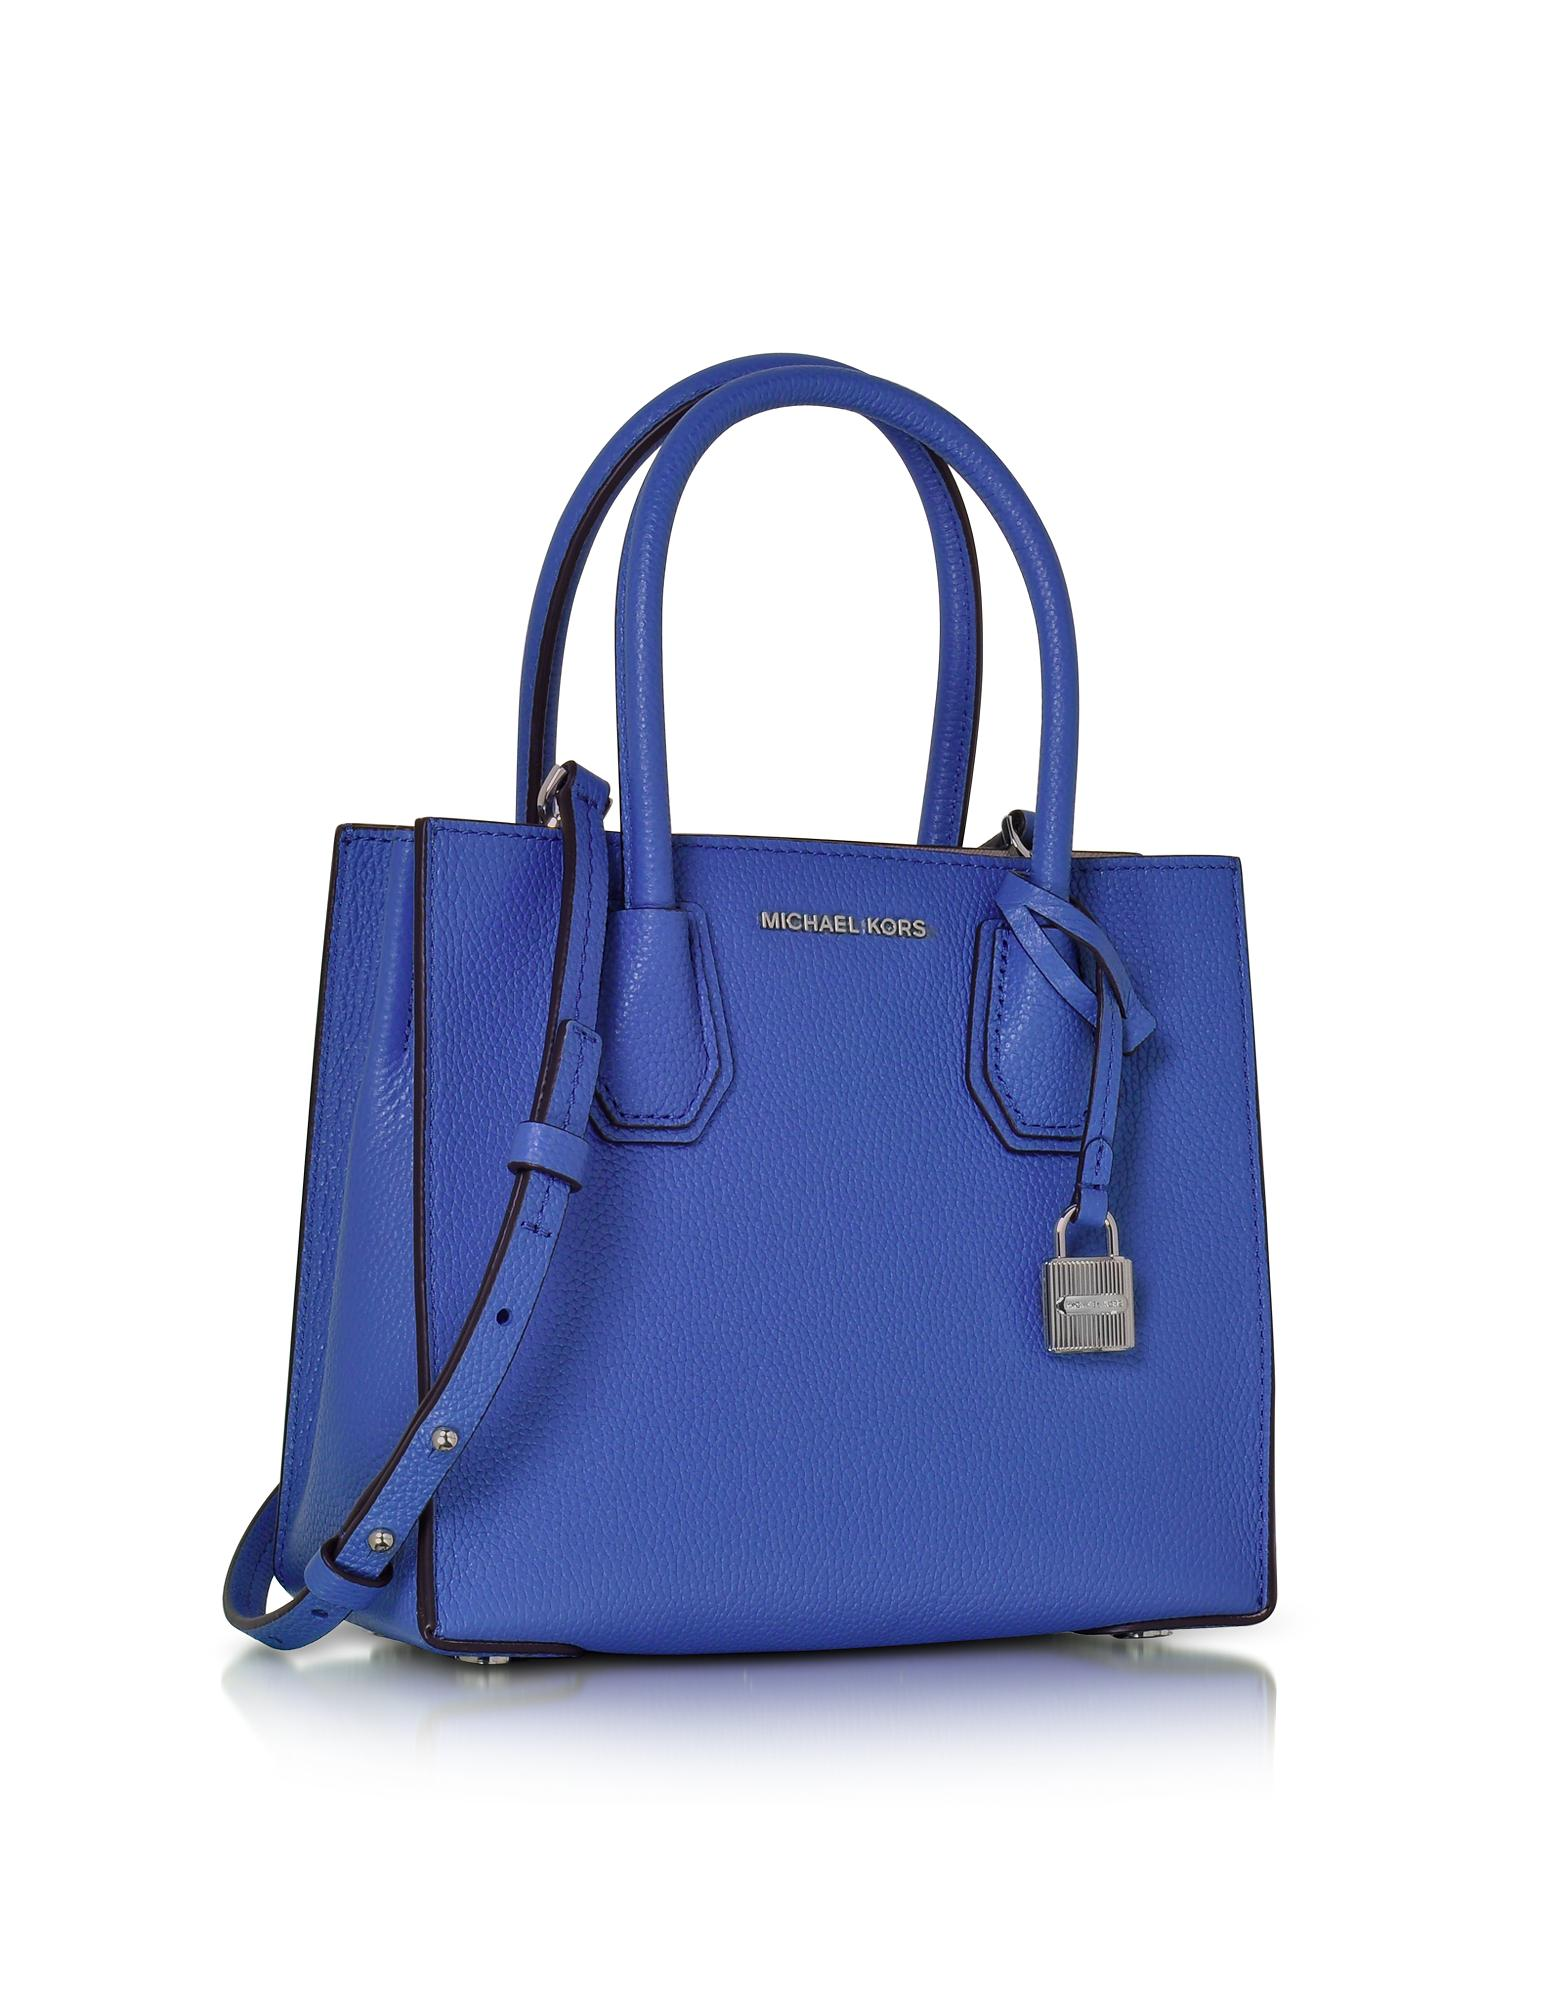 9587b4add587a8 Michael Kors Mercer Medium Electric Blue Pebble Leather Crossbody ...